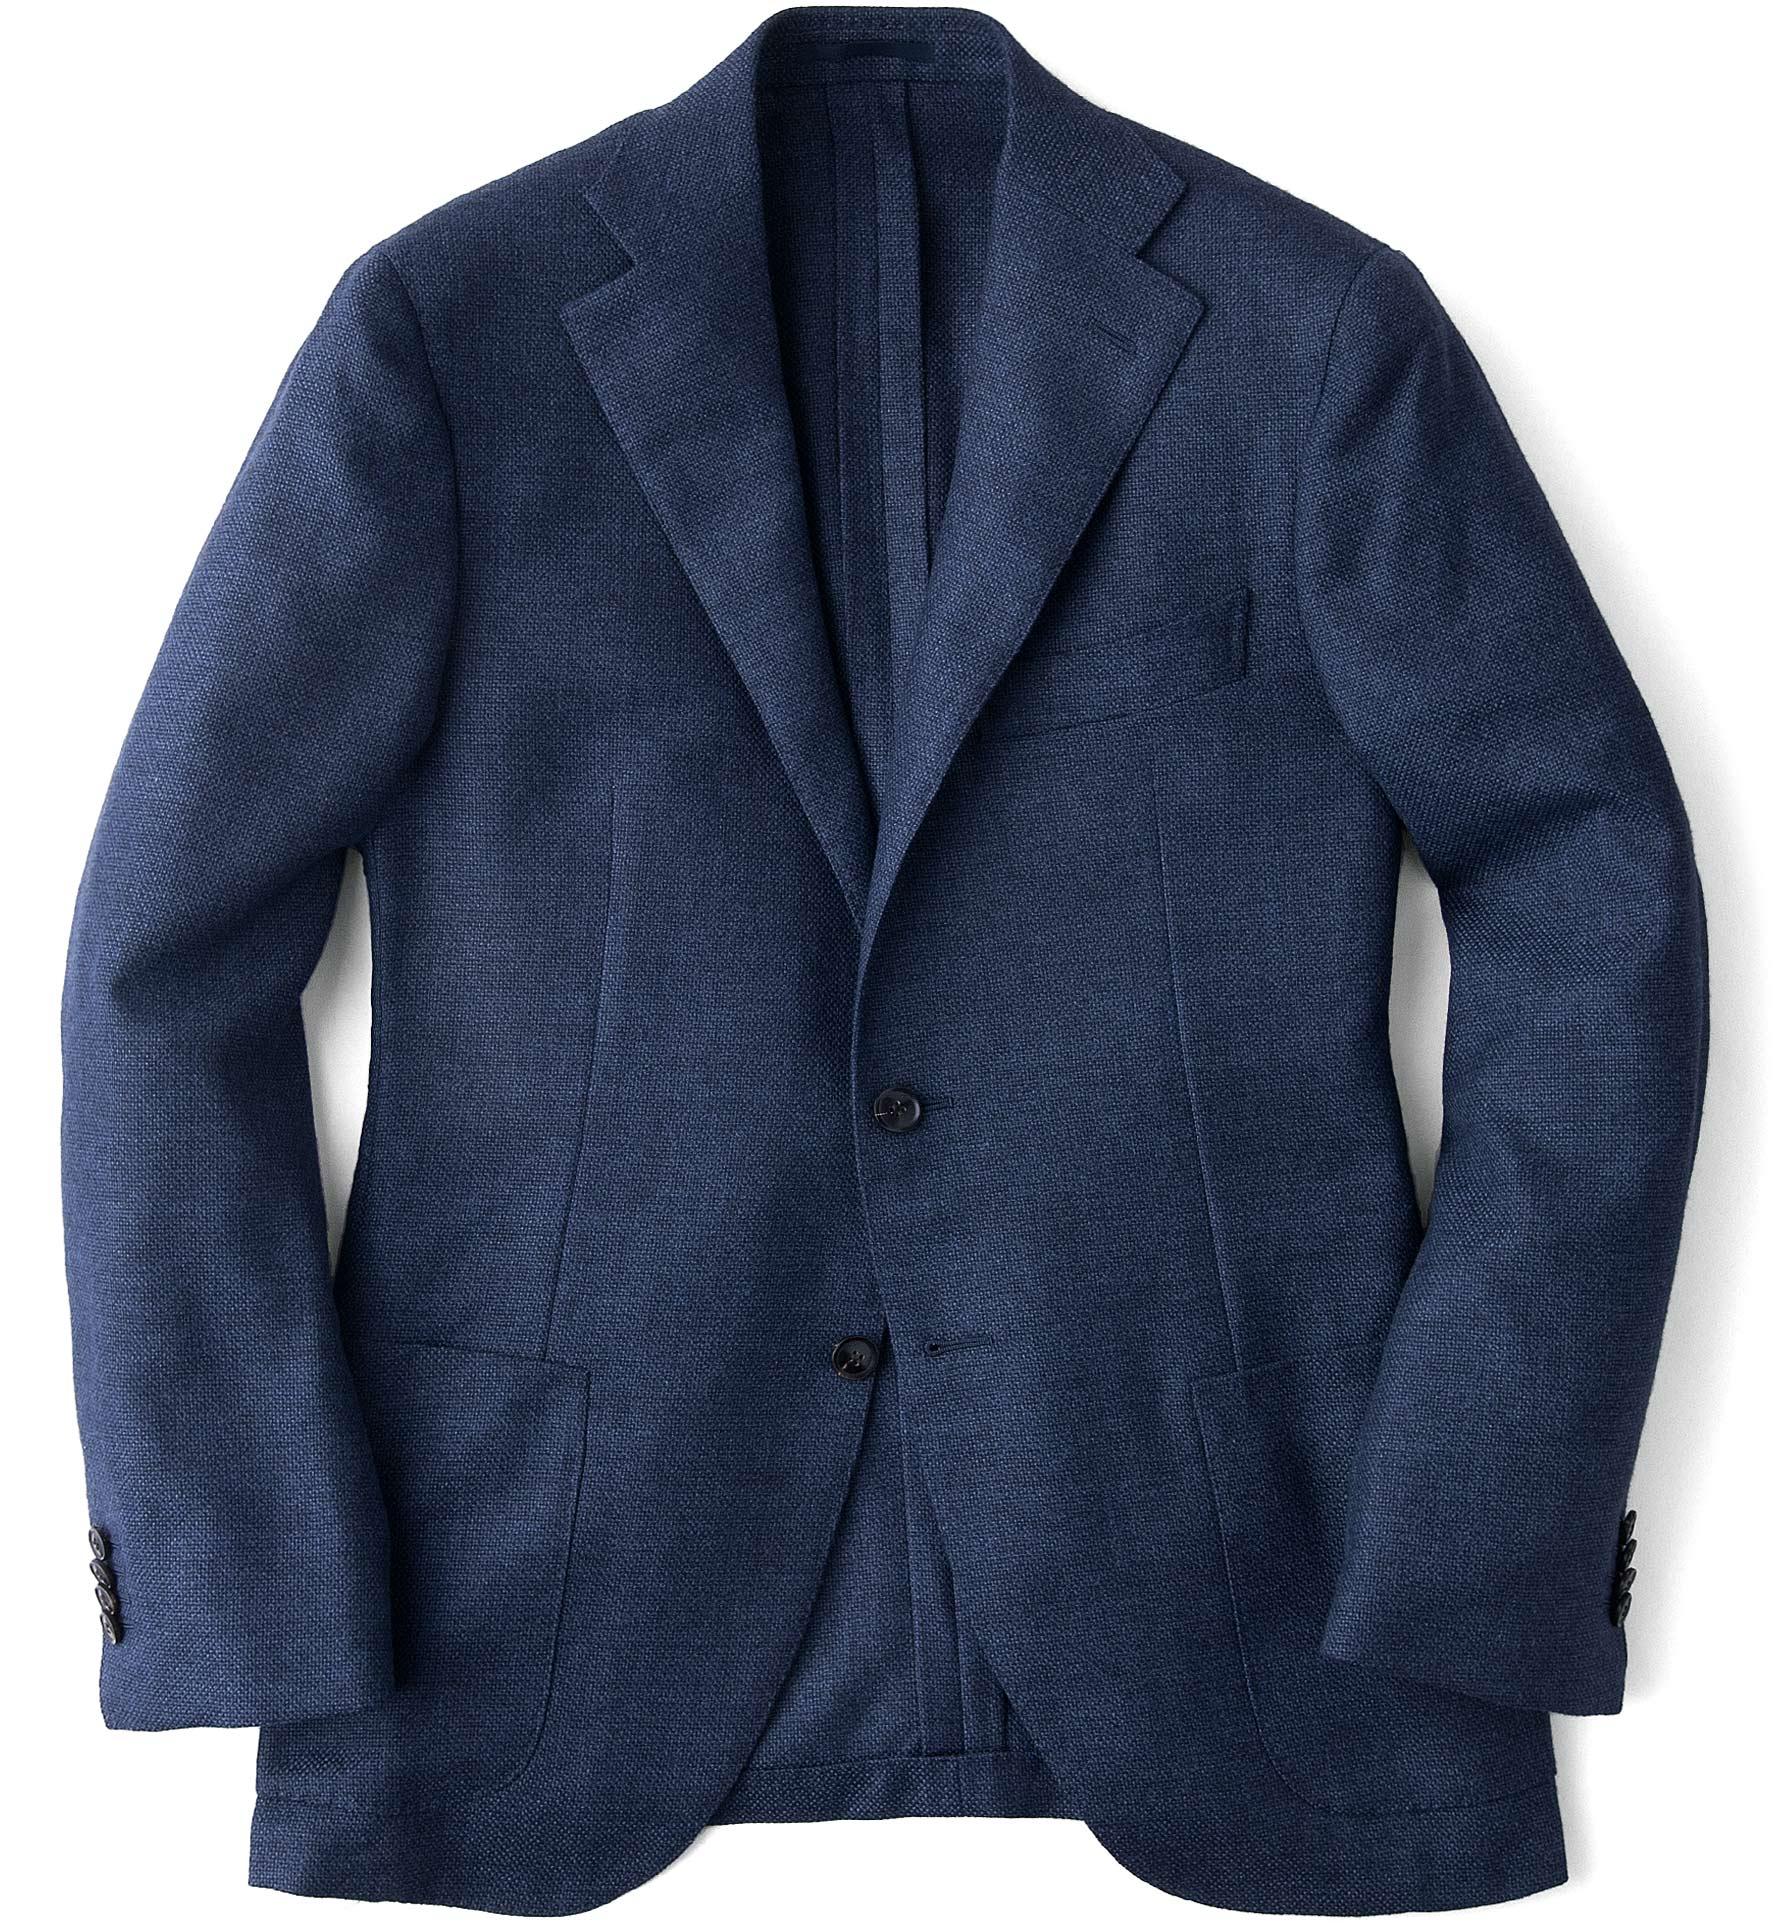 Zoom Image of Ocean Wool Cashmere Basketweave Hudson Jacket